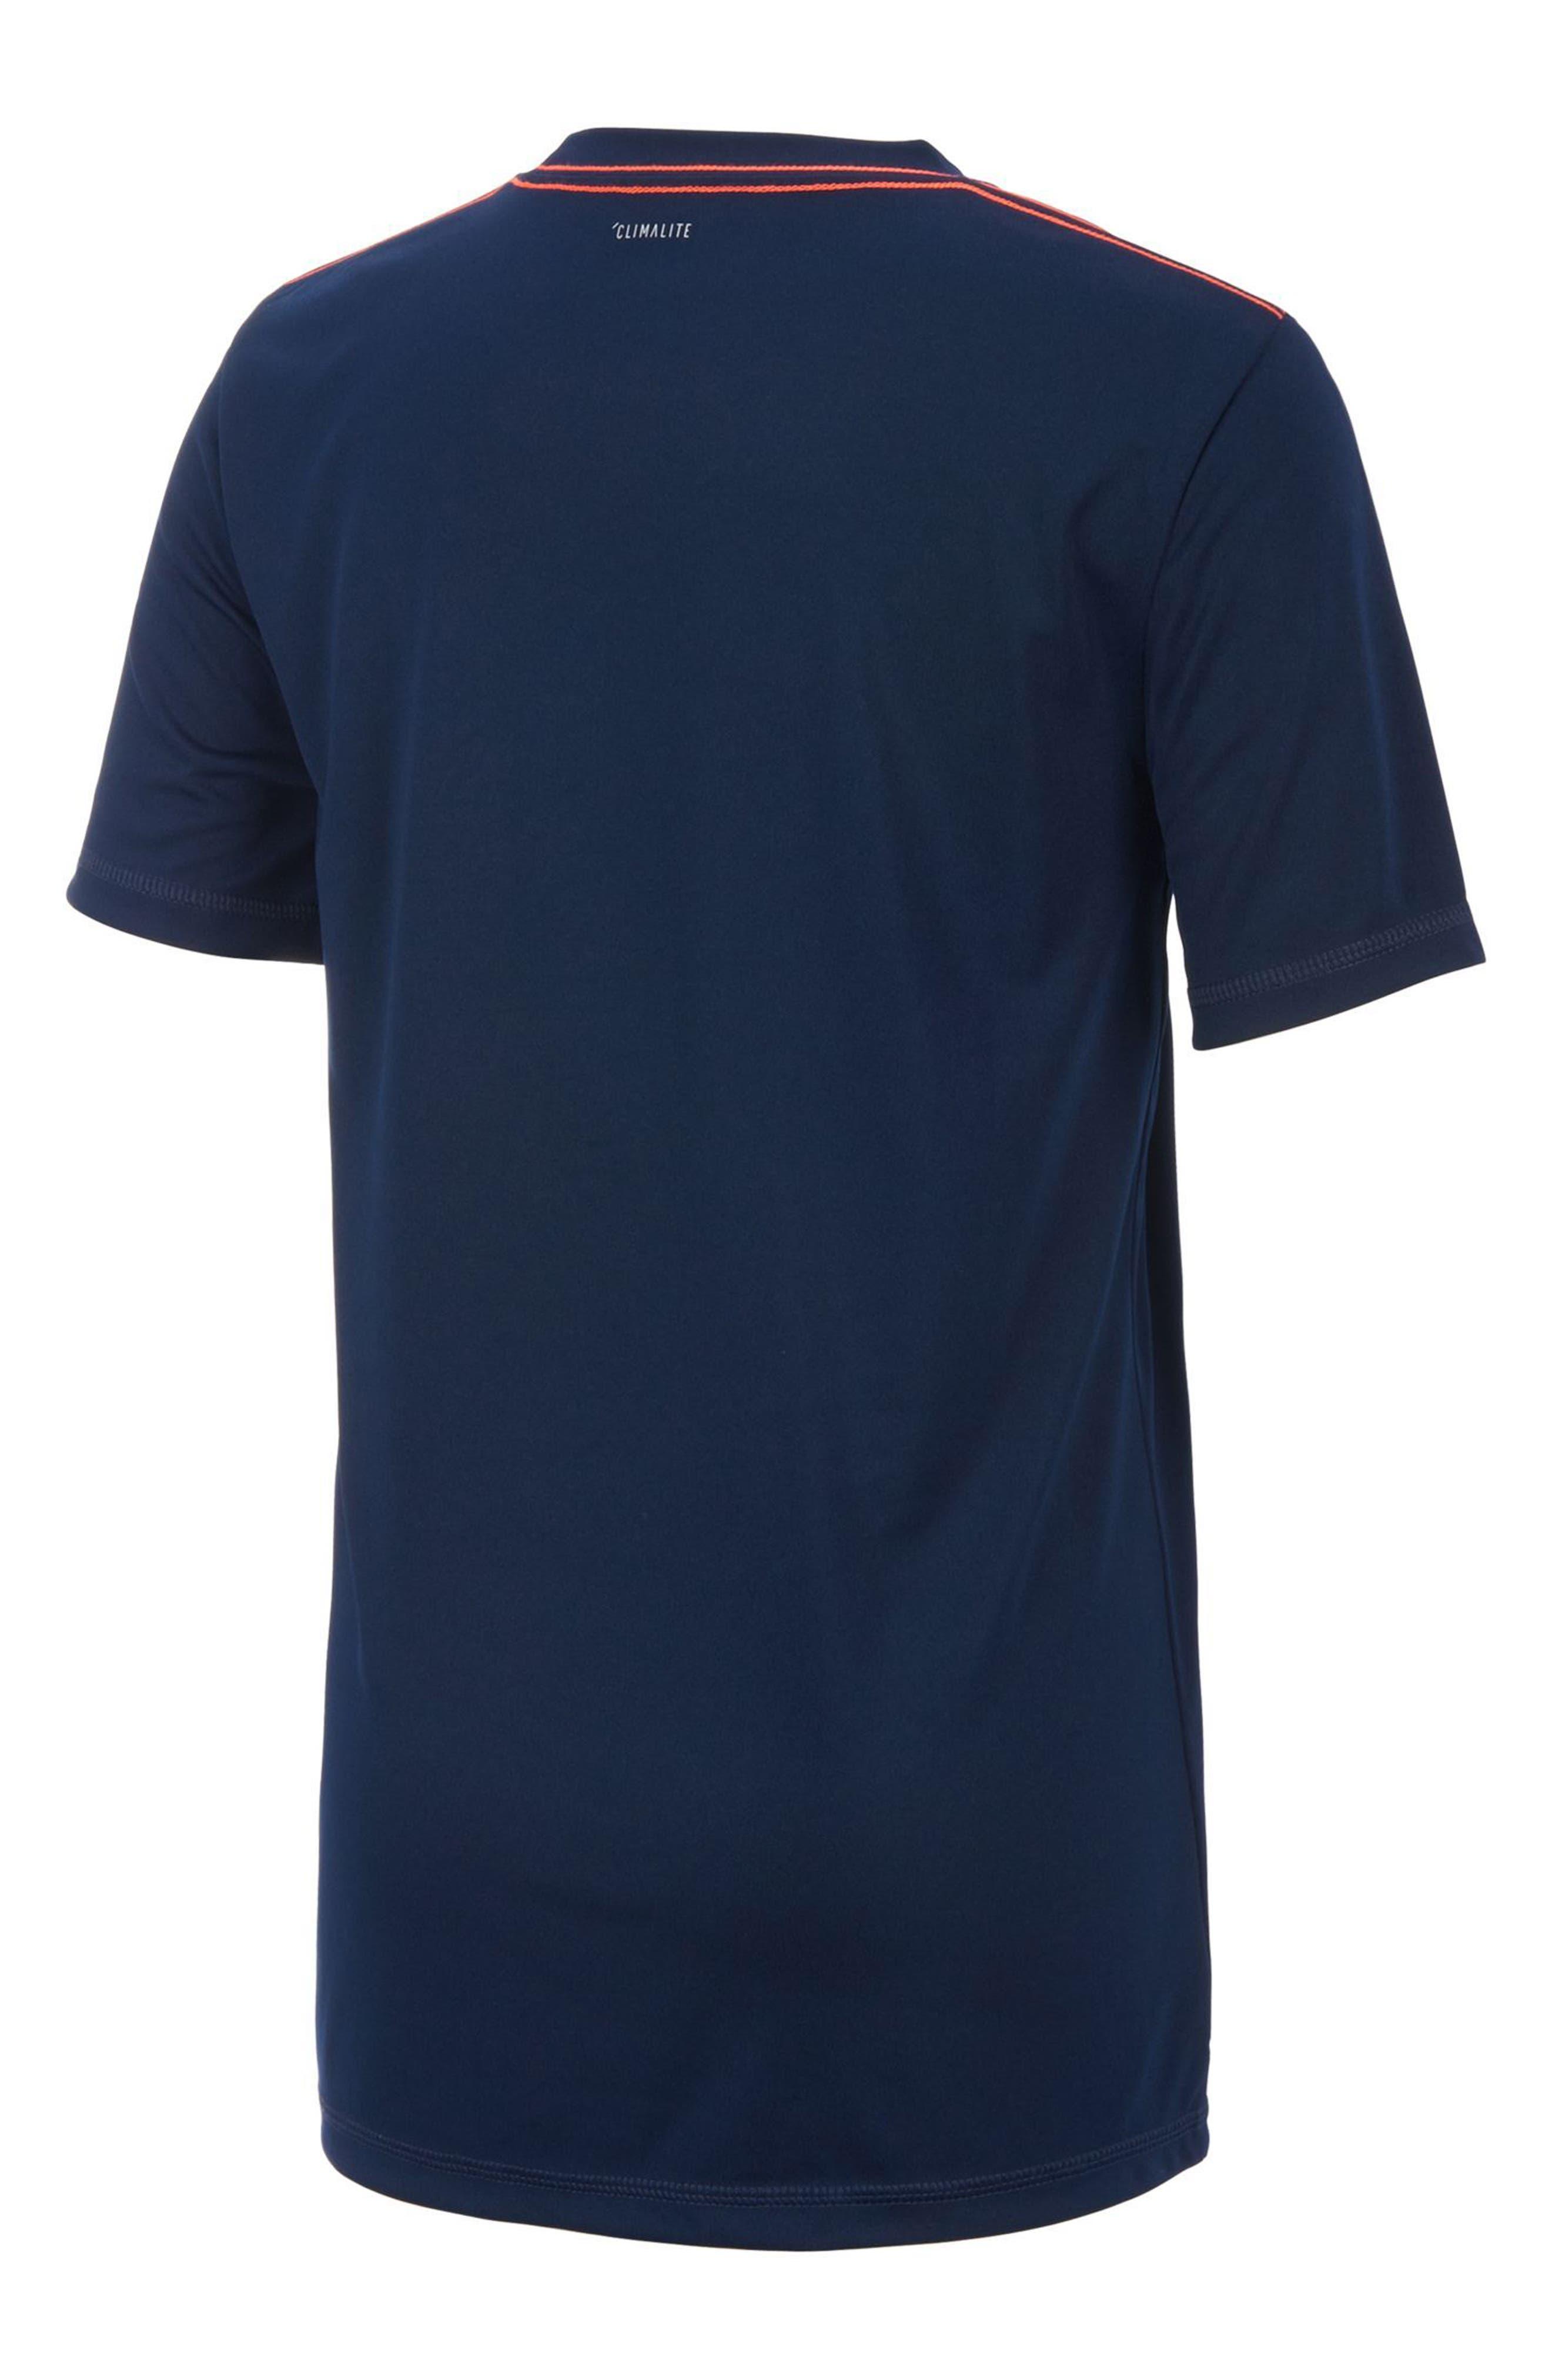 Logo T-Shirt,                             Alternate thumbnail 2, color,                             Navy